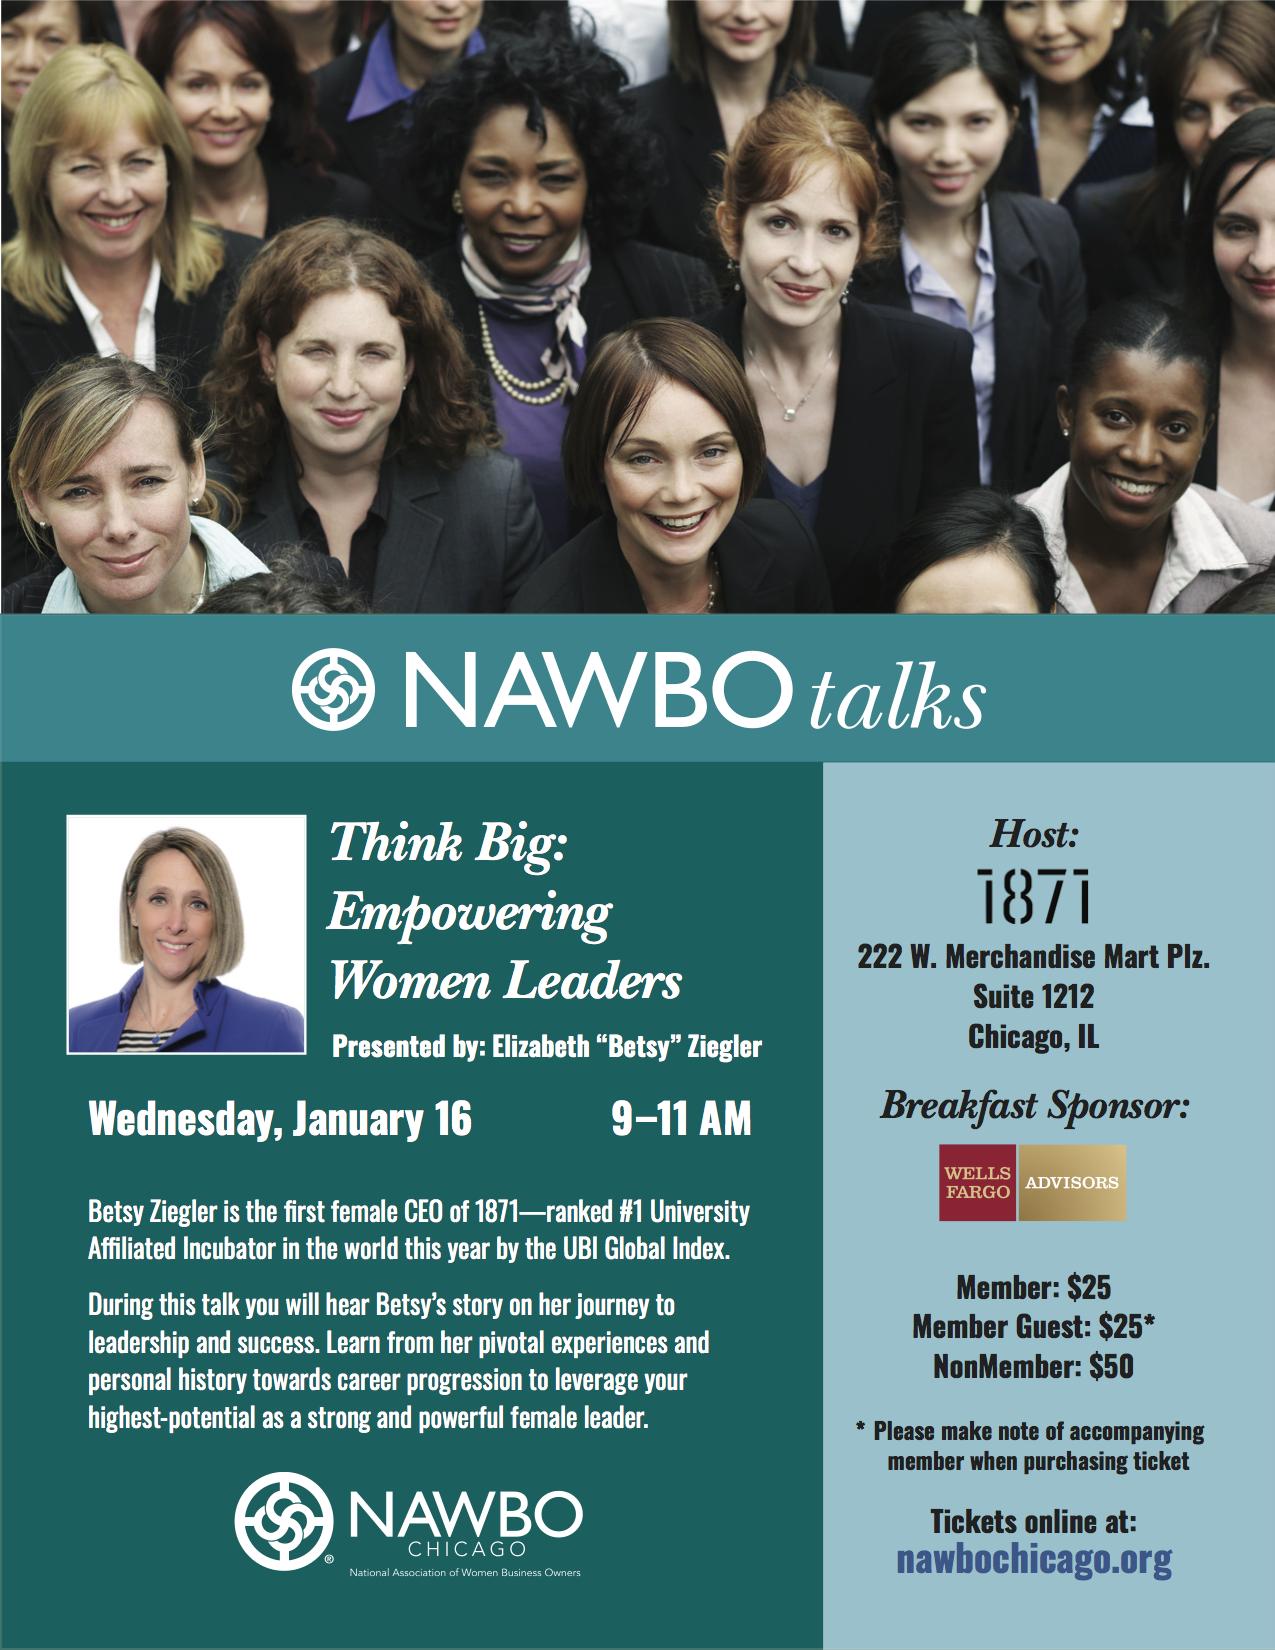 NAWBO Talks - Think Big: Empowering Women Leaders